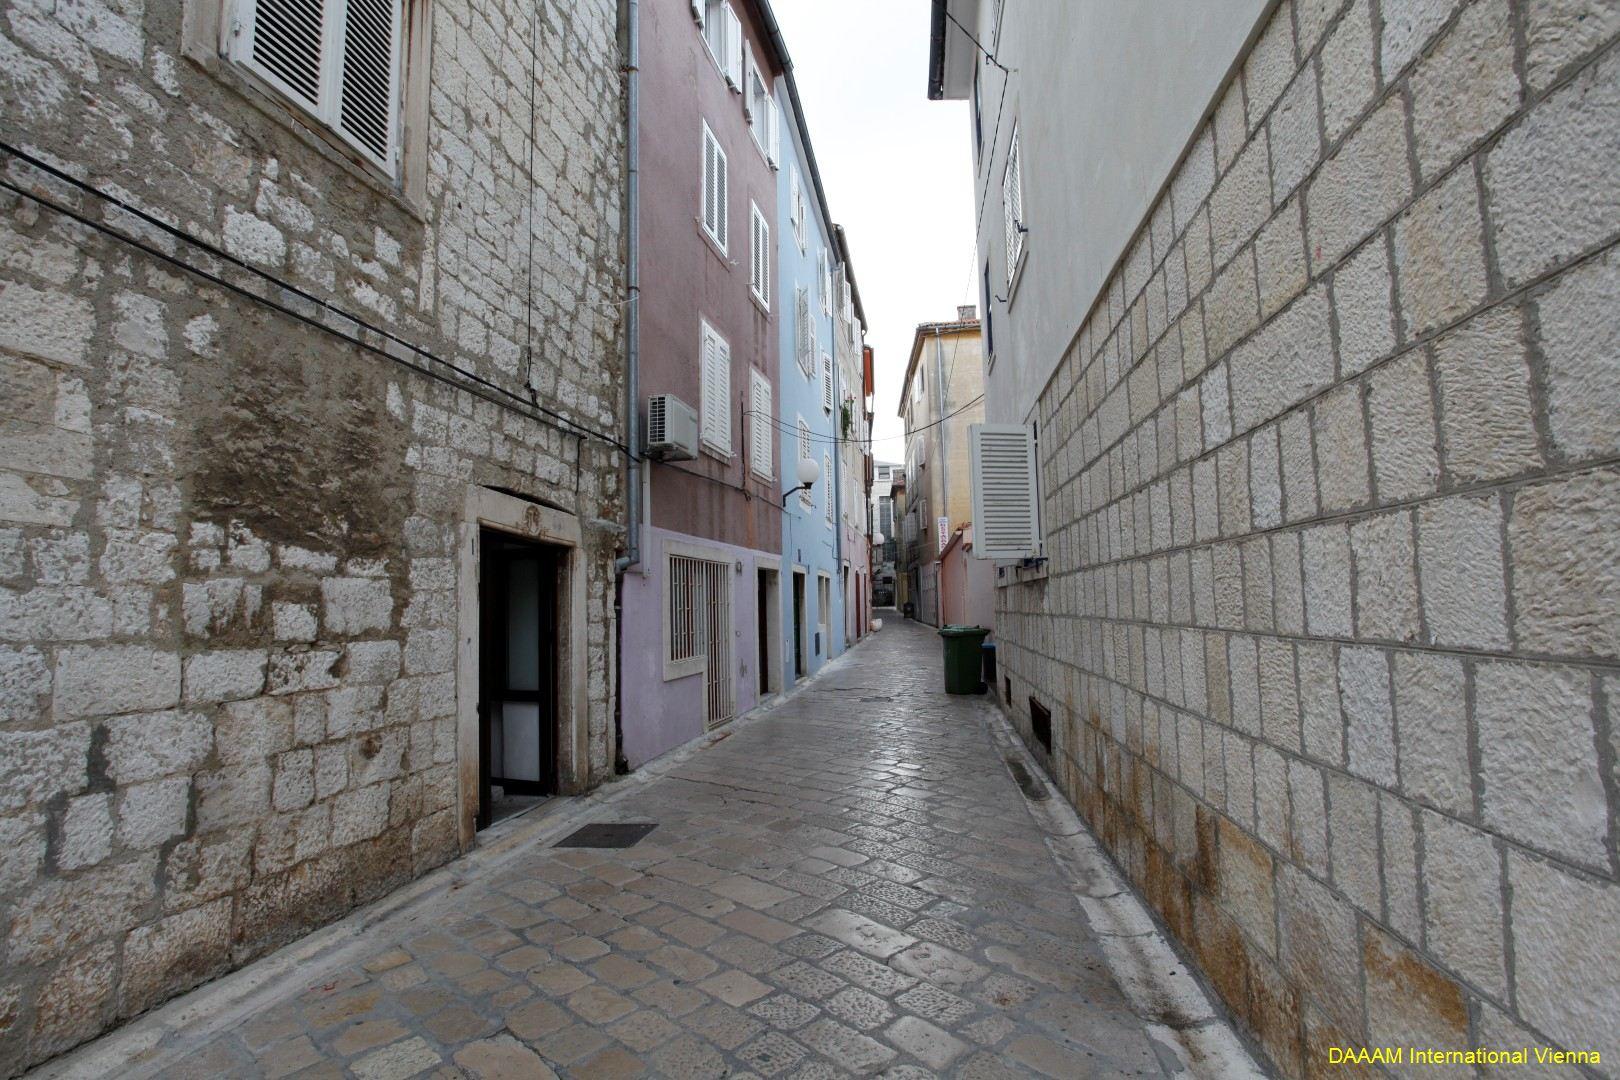 DAAAM_2012_Zadar_00_Zadar_City_046